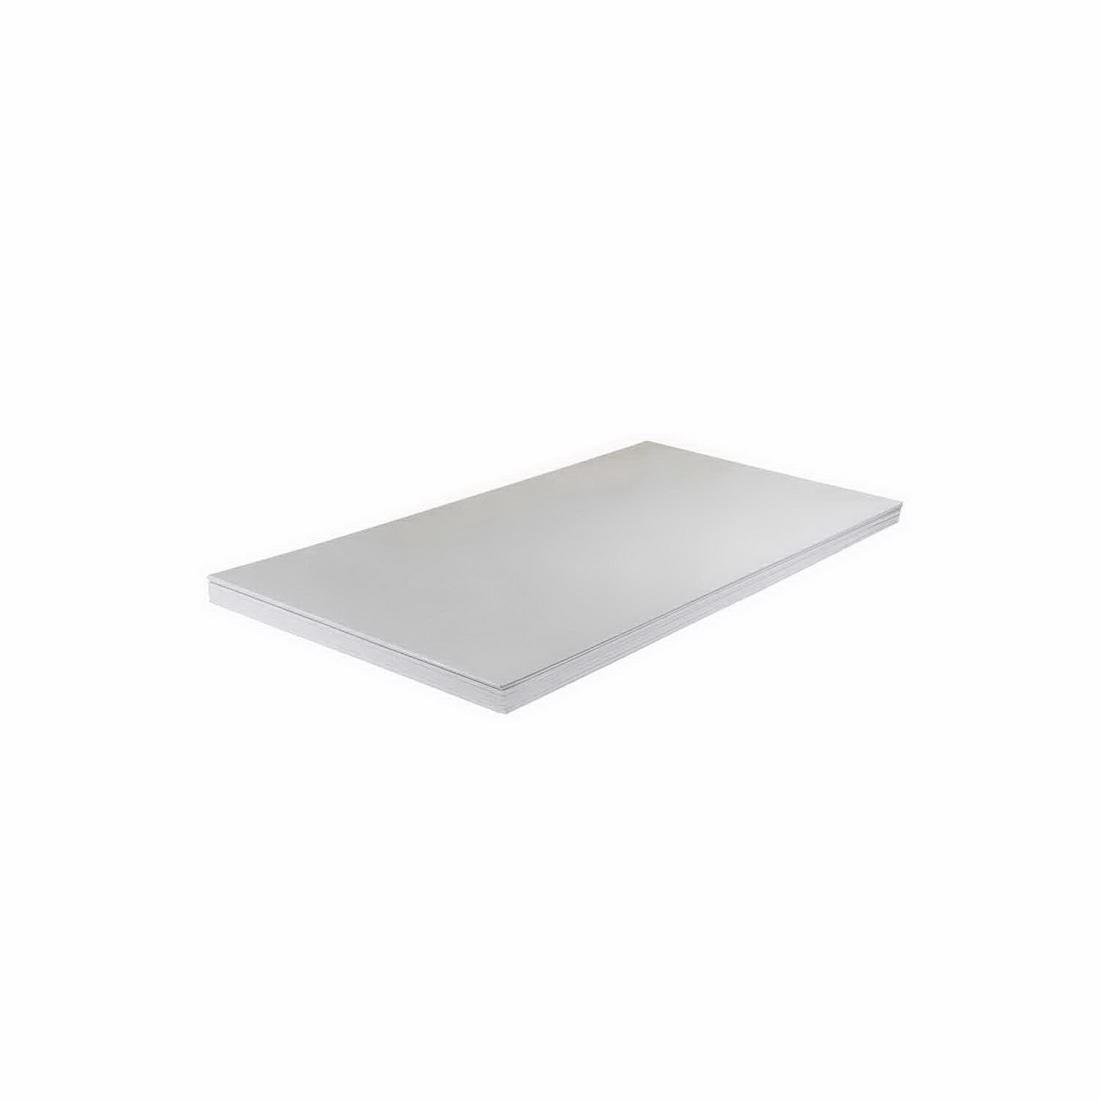 HardieGlaze Premium Lining 6mm 2400 x 1200mm White